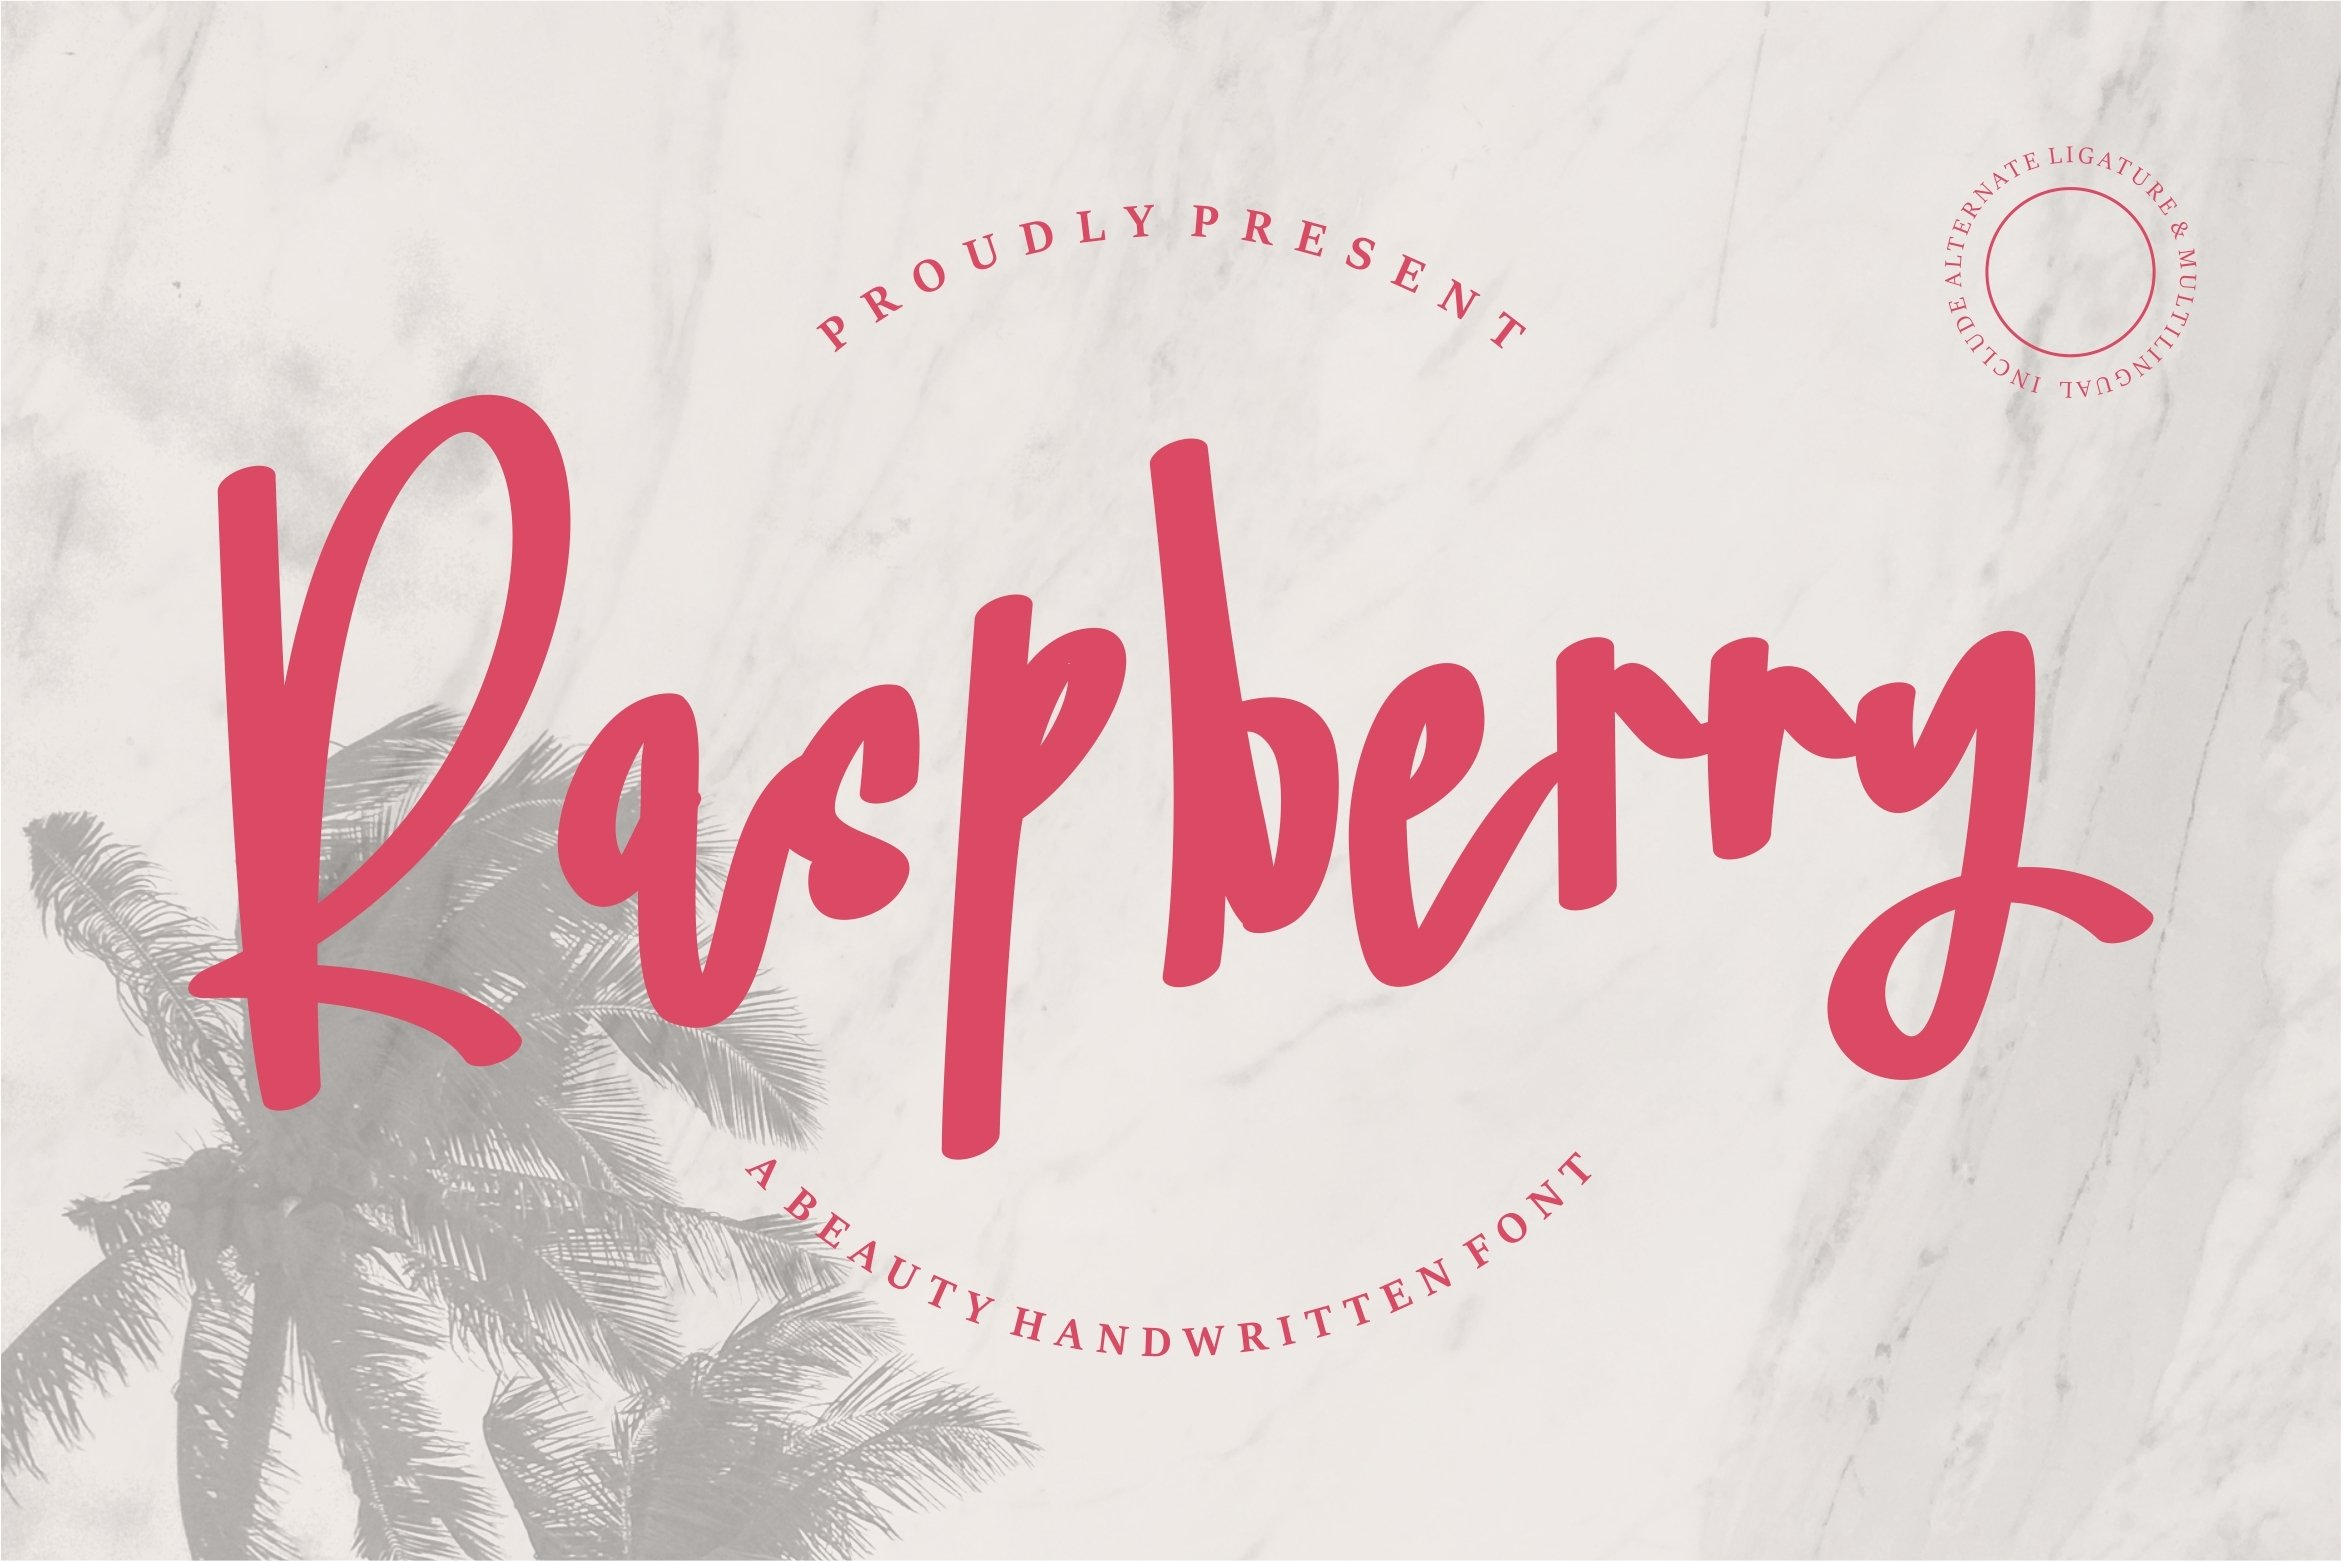 Raspberry - A Beauty Handwritten Font example image 1